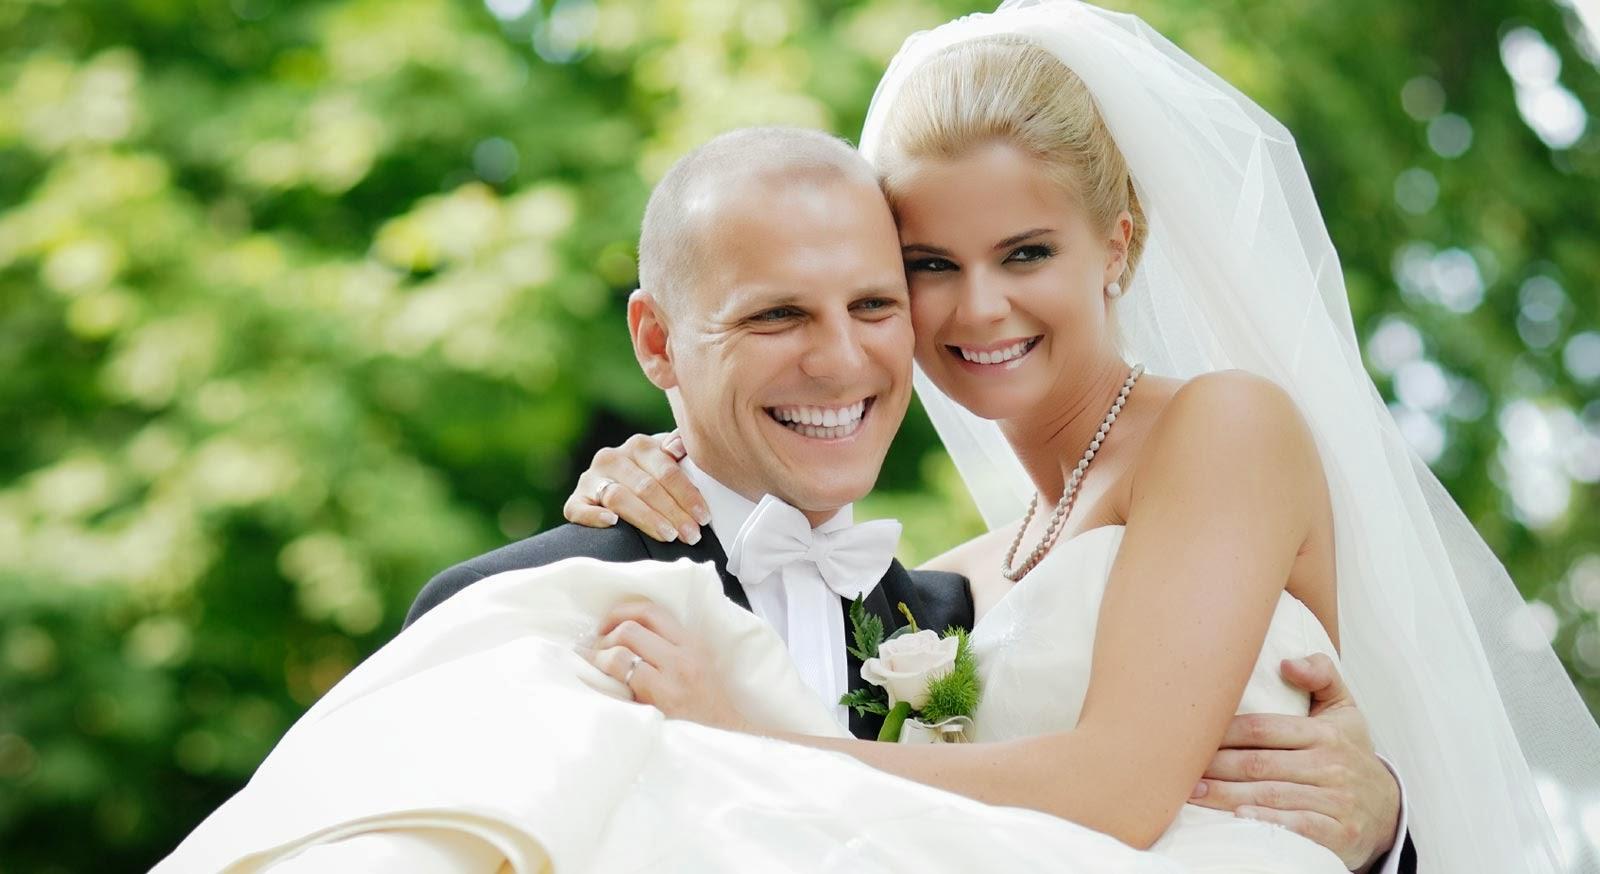 Top Wedding Songs 2015 List